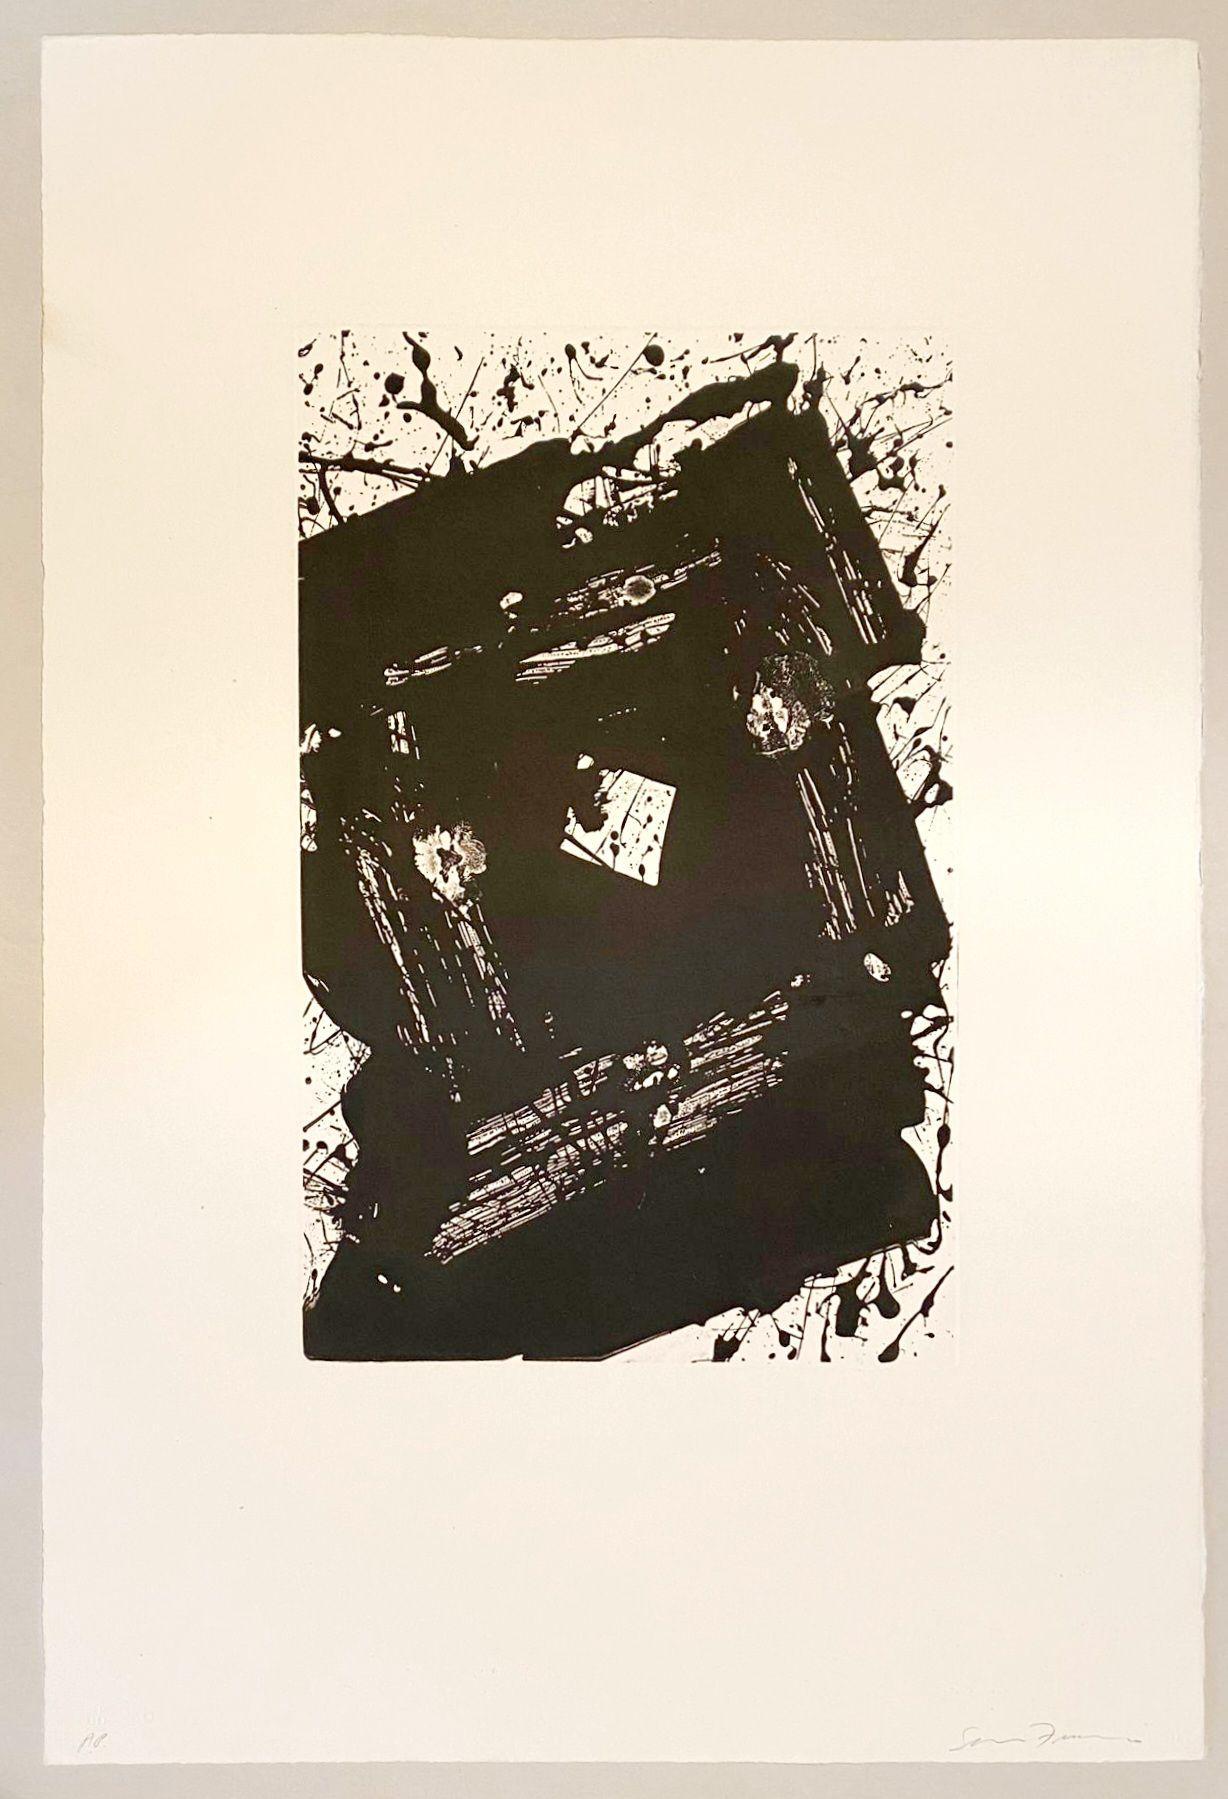 Sam Francis - Untitled, 1981